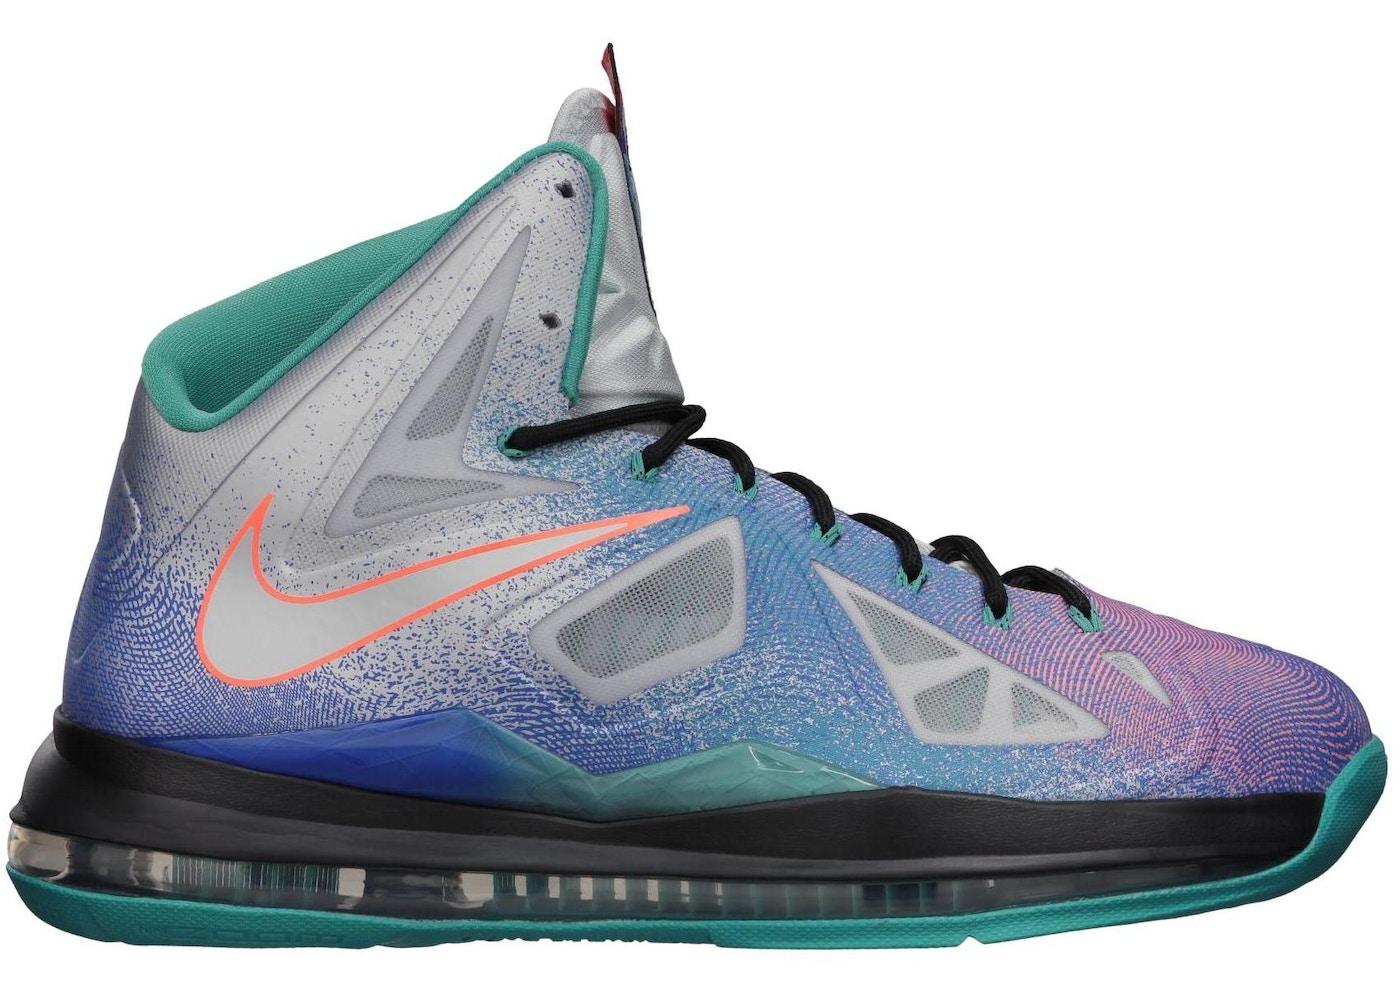 53bd5f63c4bb Buy Nike LeBron 10 Shoes   Deadstock Sneakers